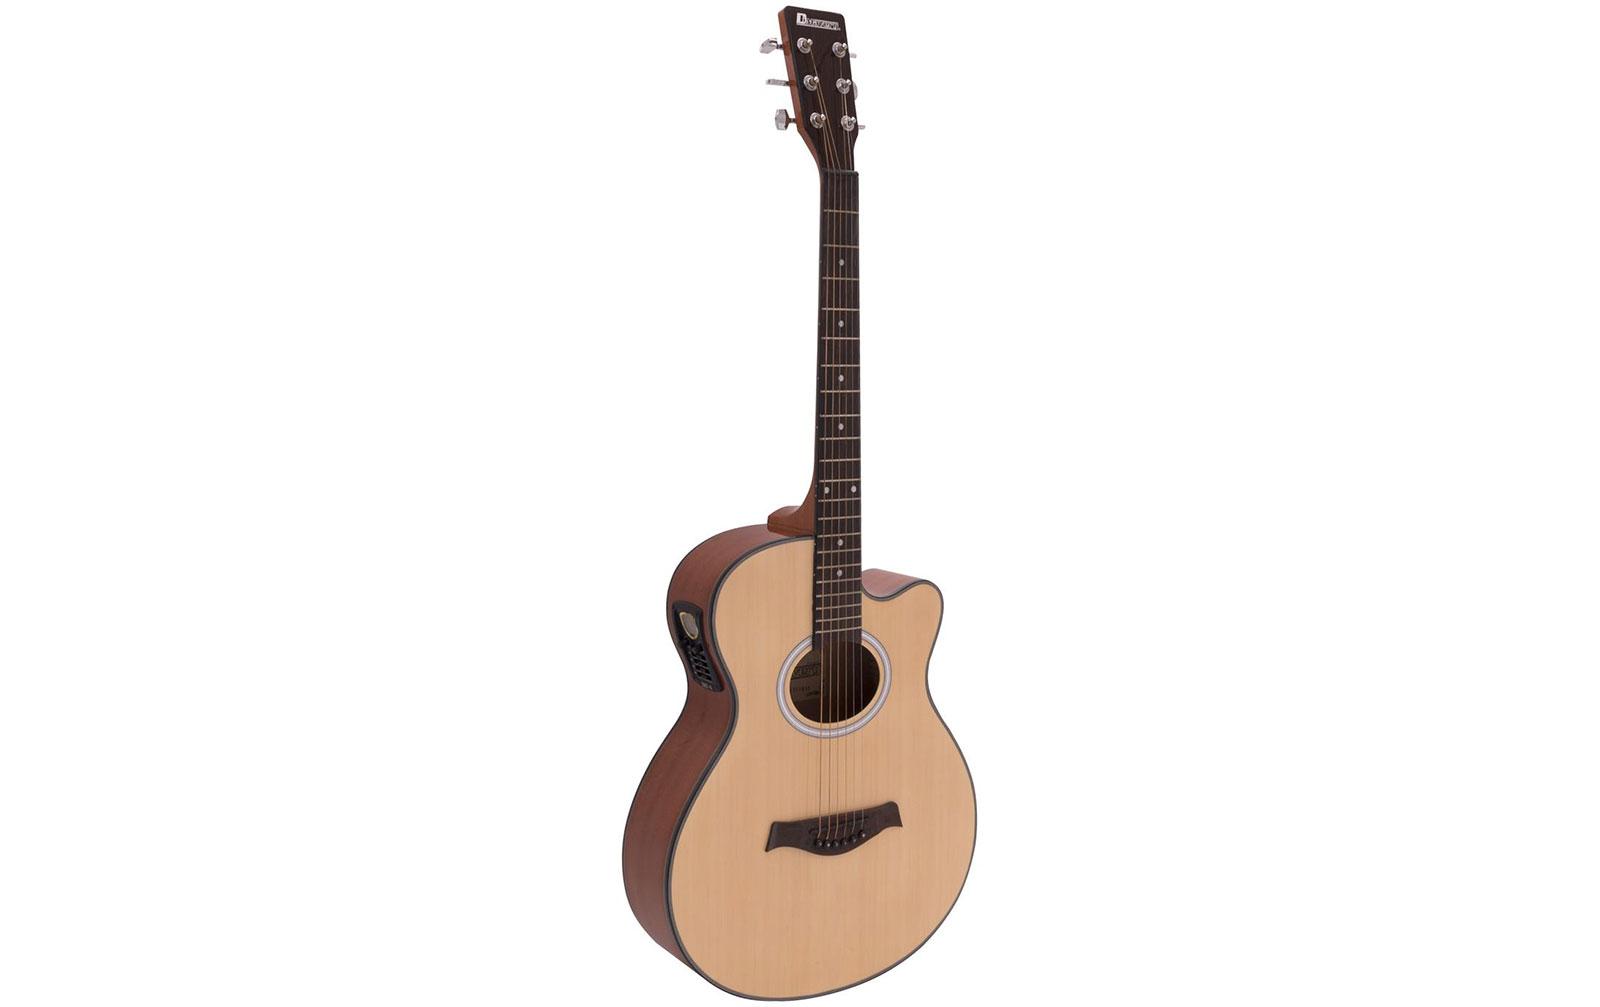 dimavery-aw-400-western-gitarre-natur